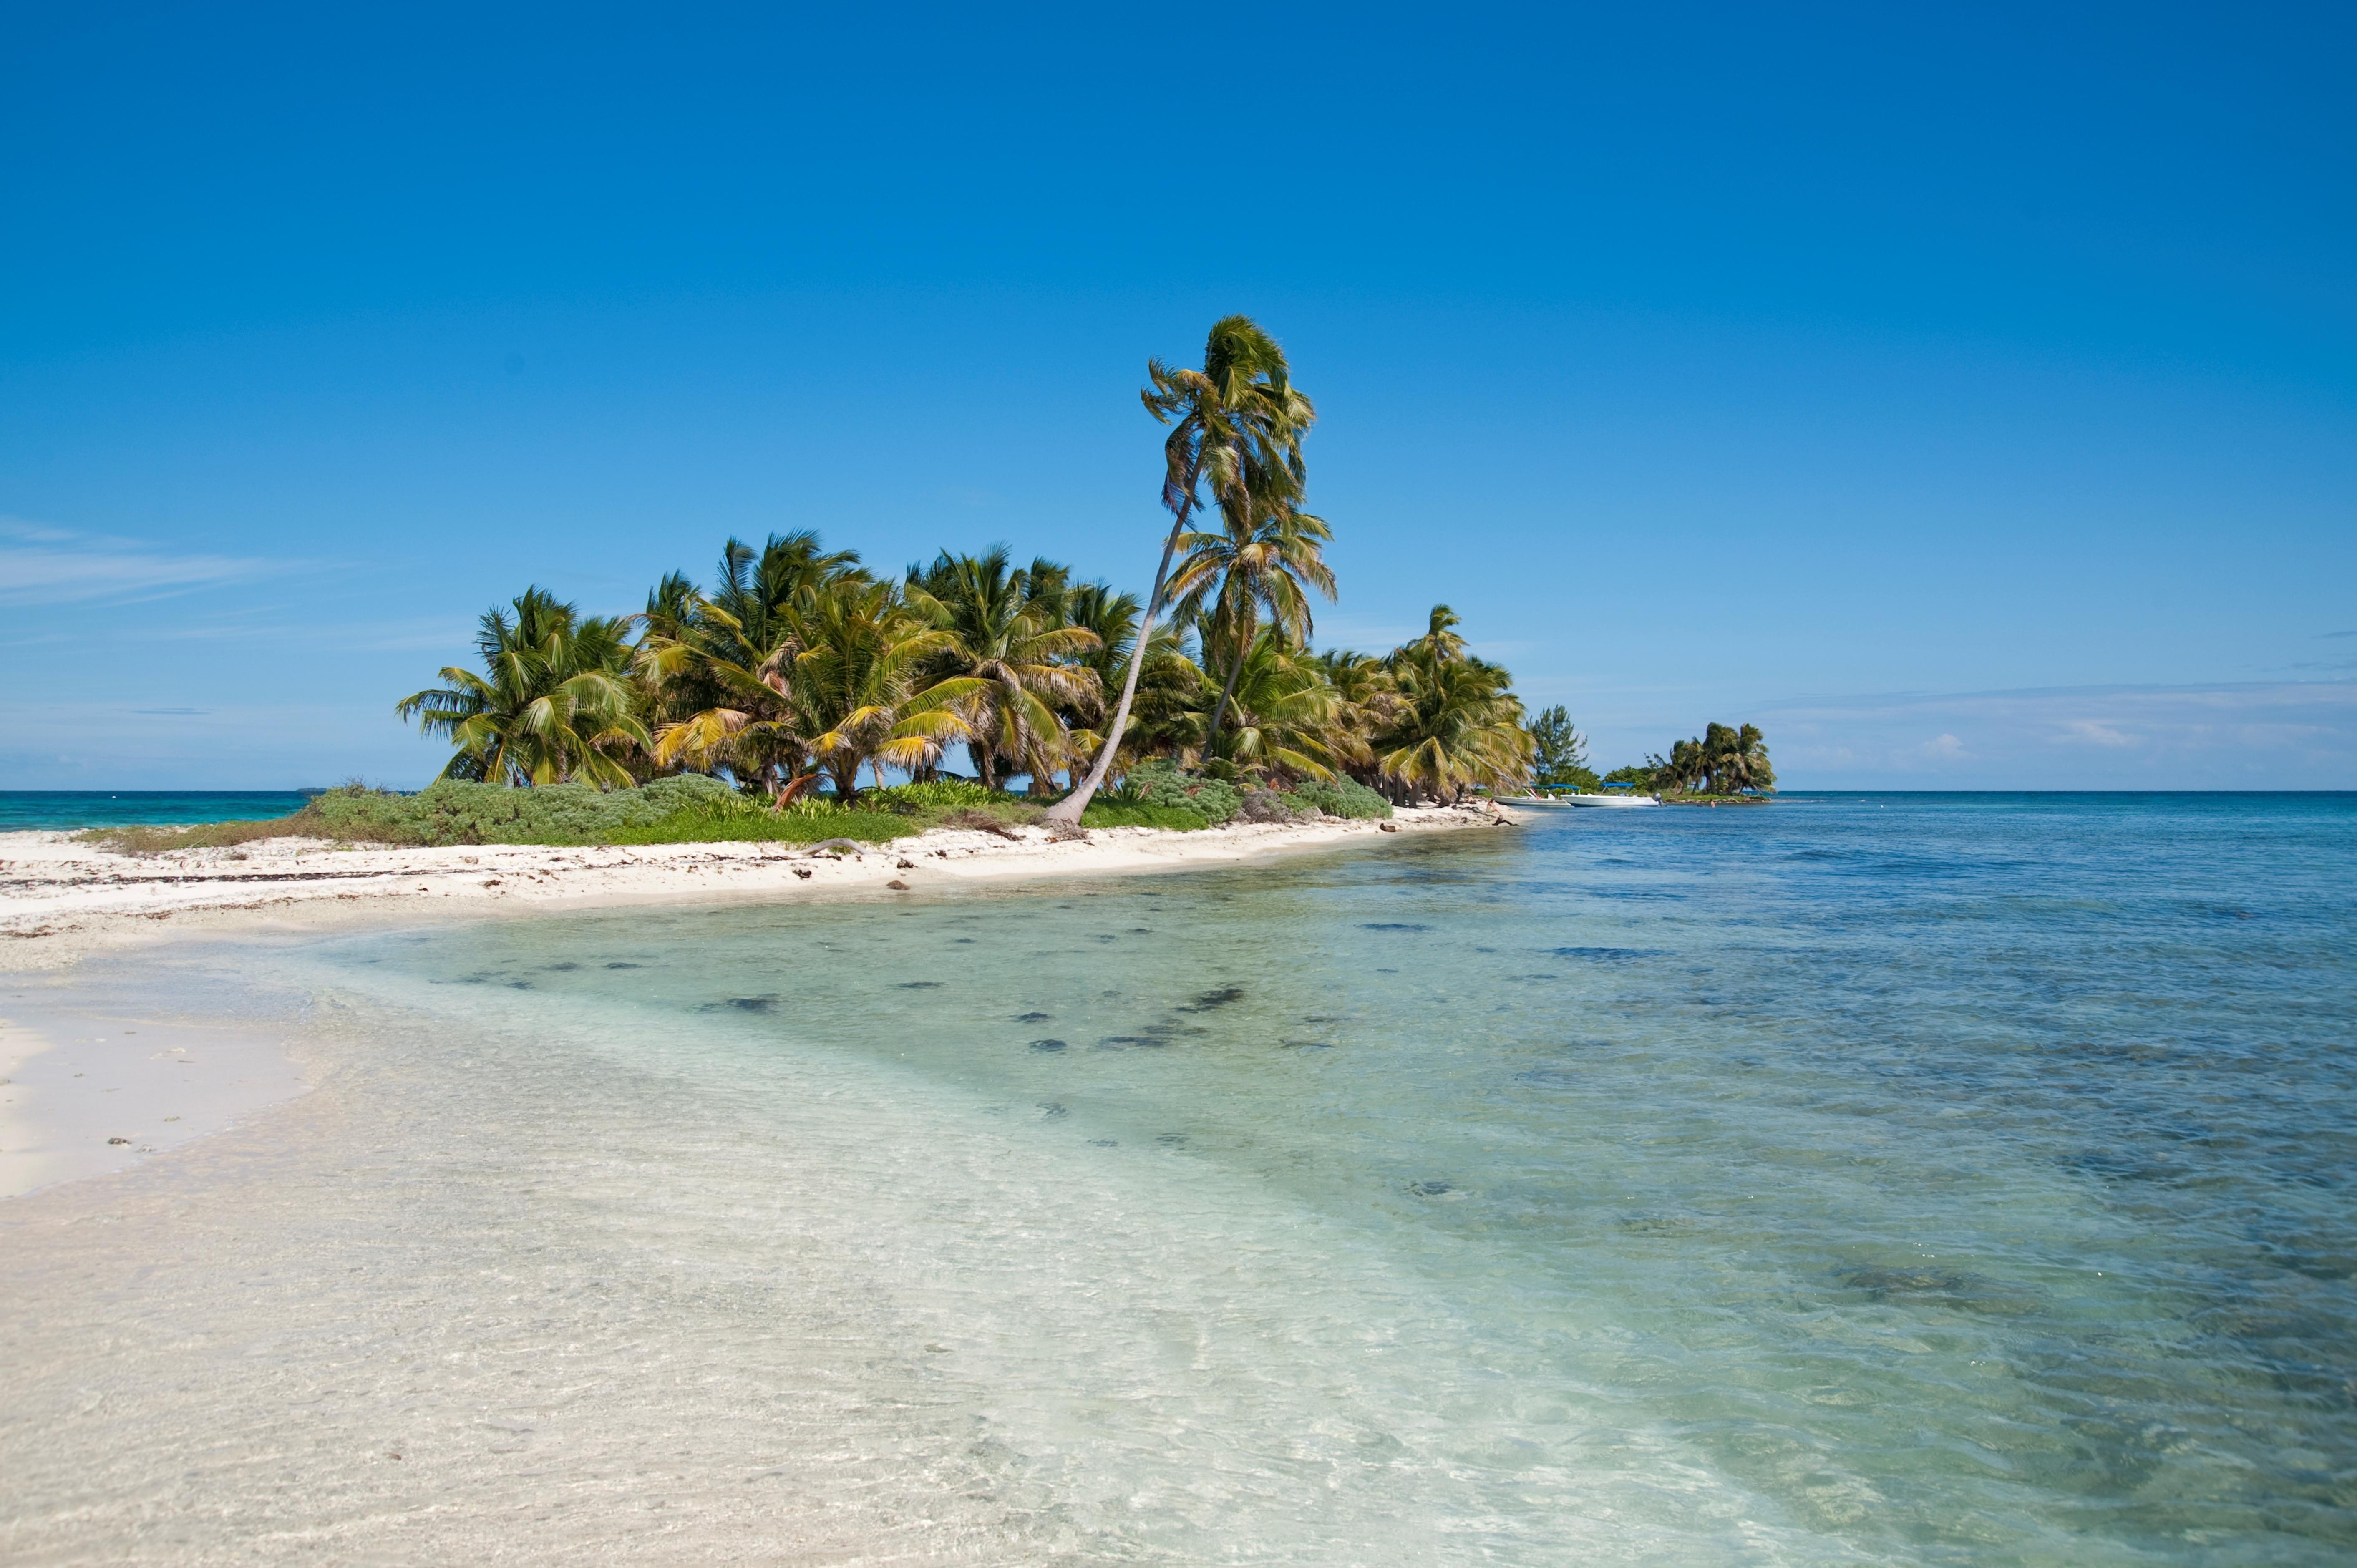 Belize in February